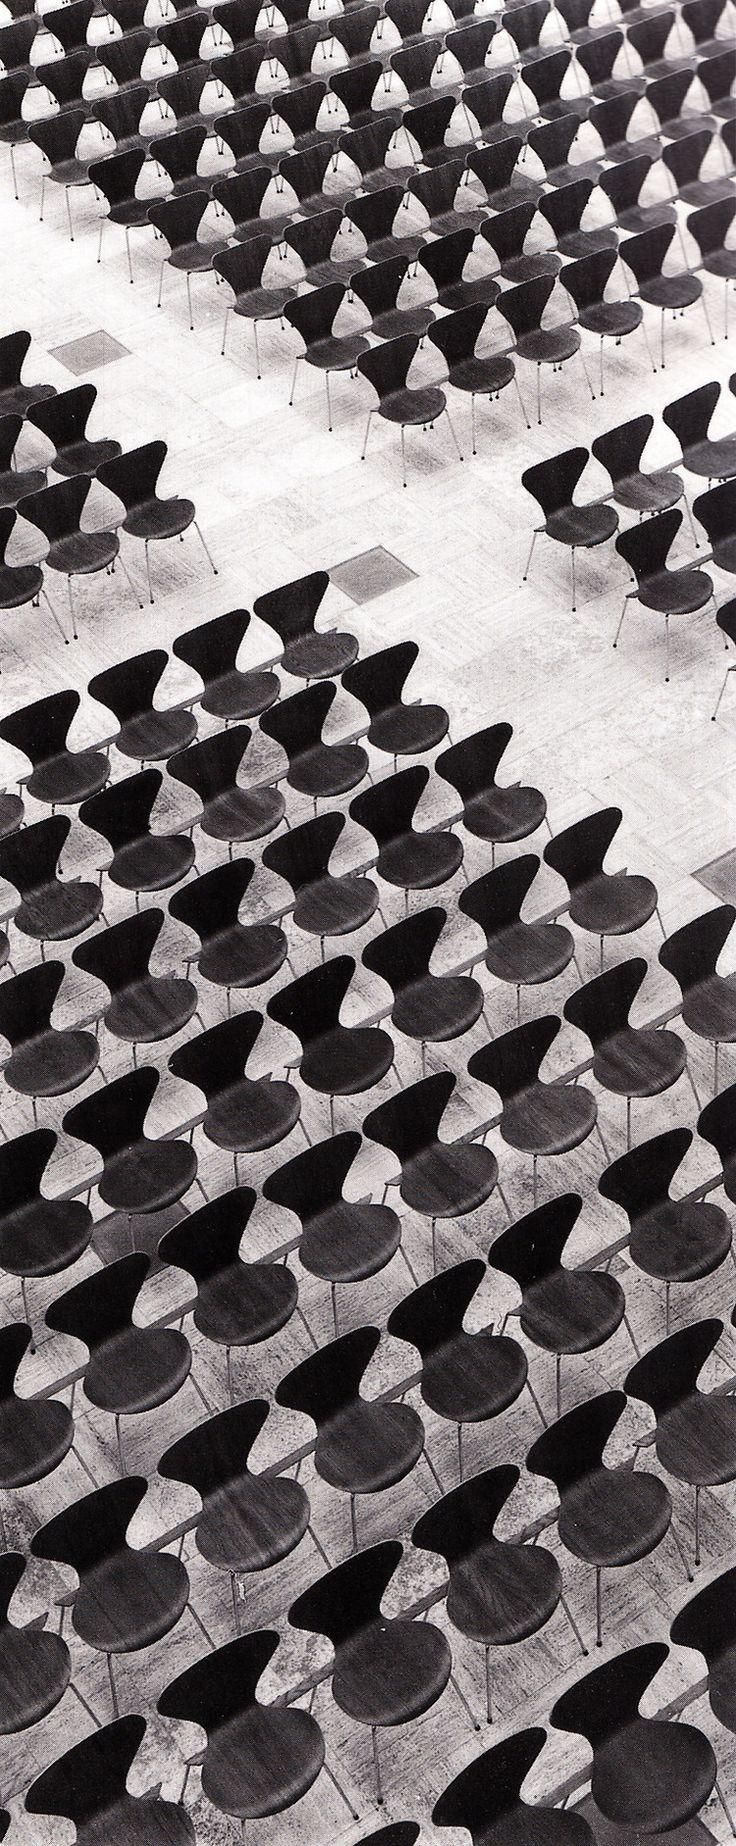 Arne Jacobsen's Series 7 chairs in Gentofte City Hall, Denmark